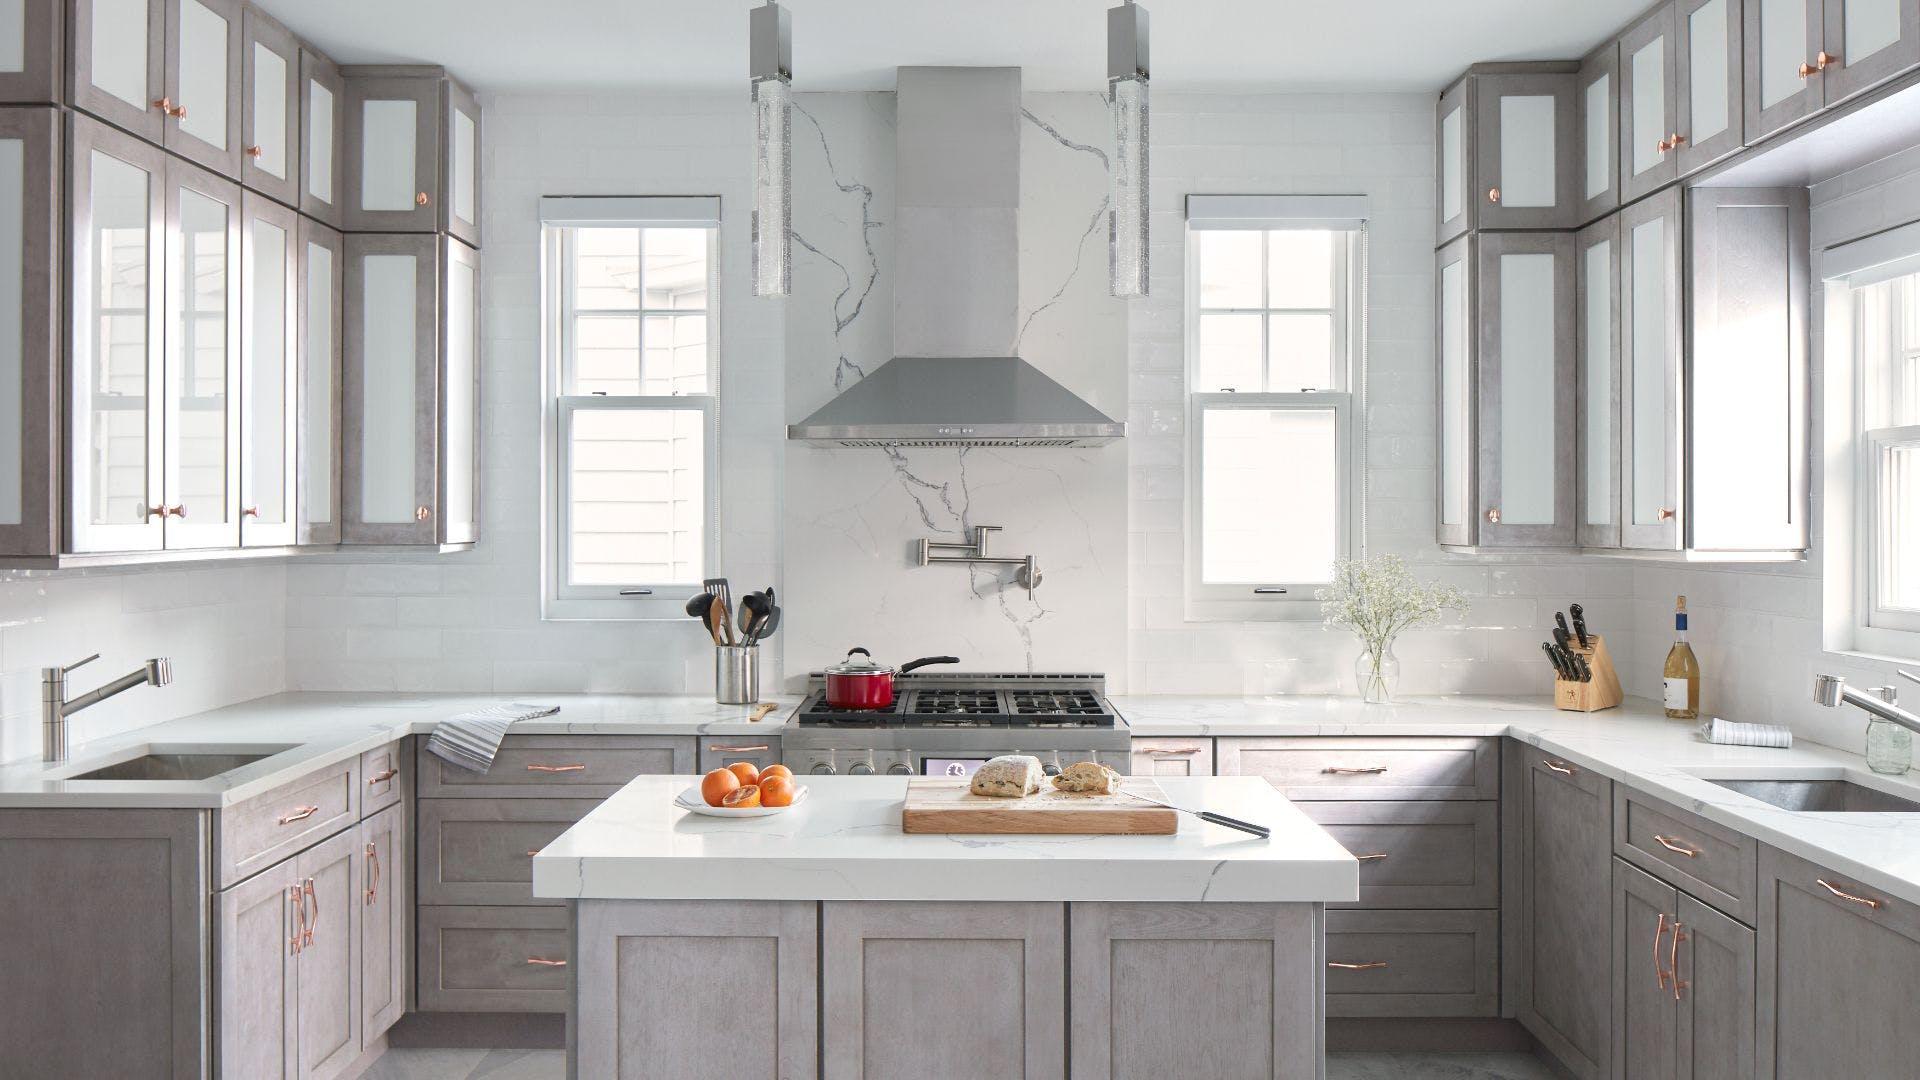 Allure Galaxy Horizon Kitchen Cabinets by Fabuwood